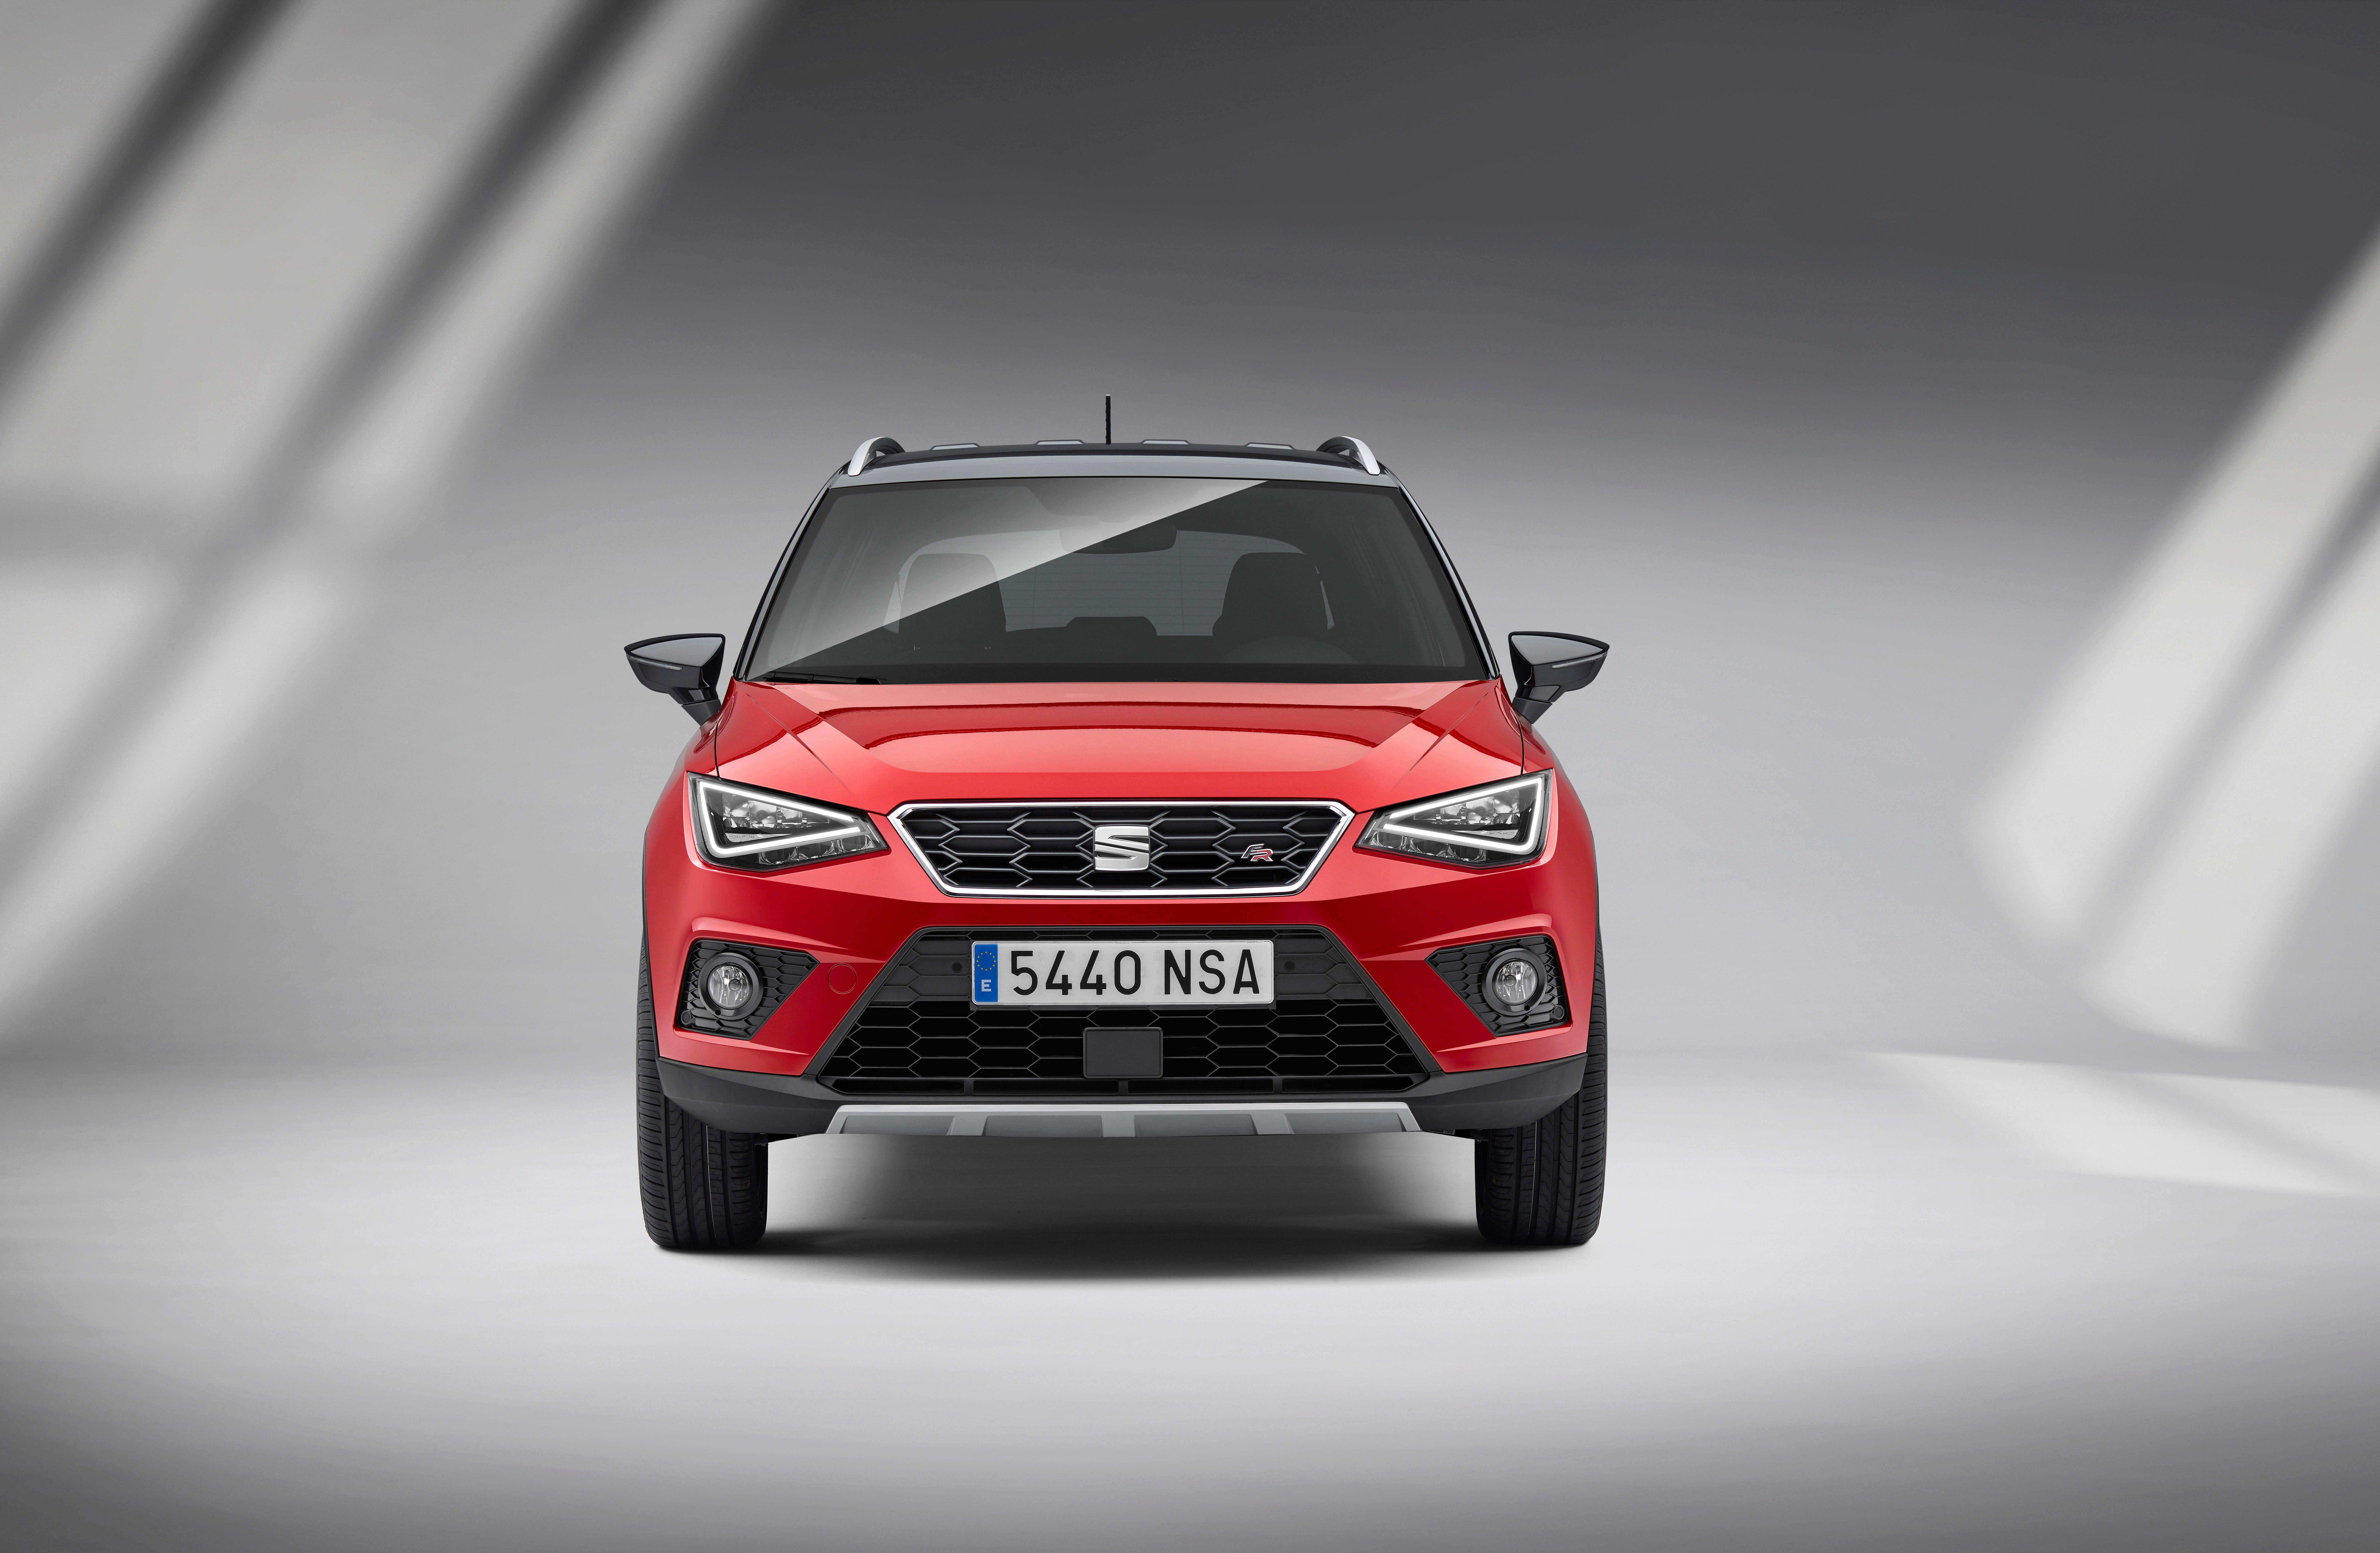 SEAT Arona: Ibiza-based B-segment crossover shown Image #677469